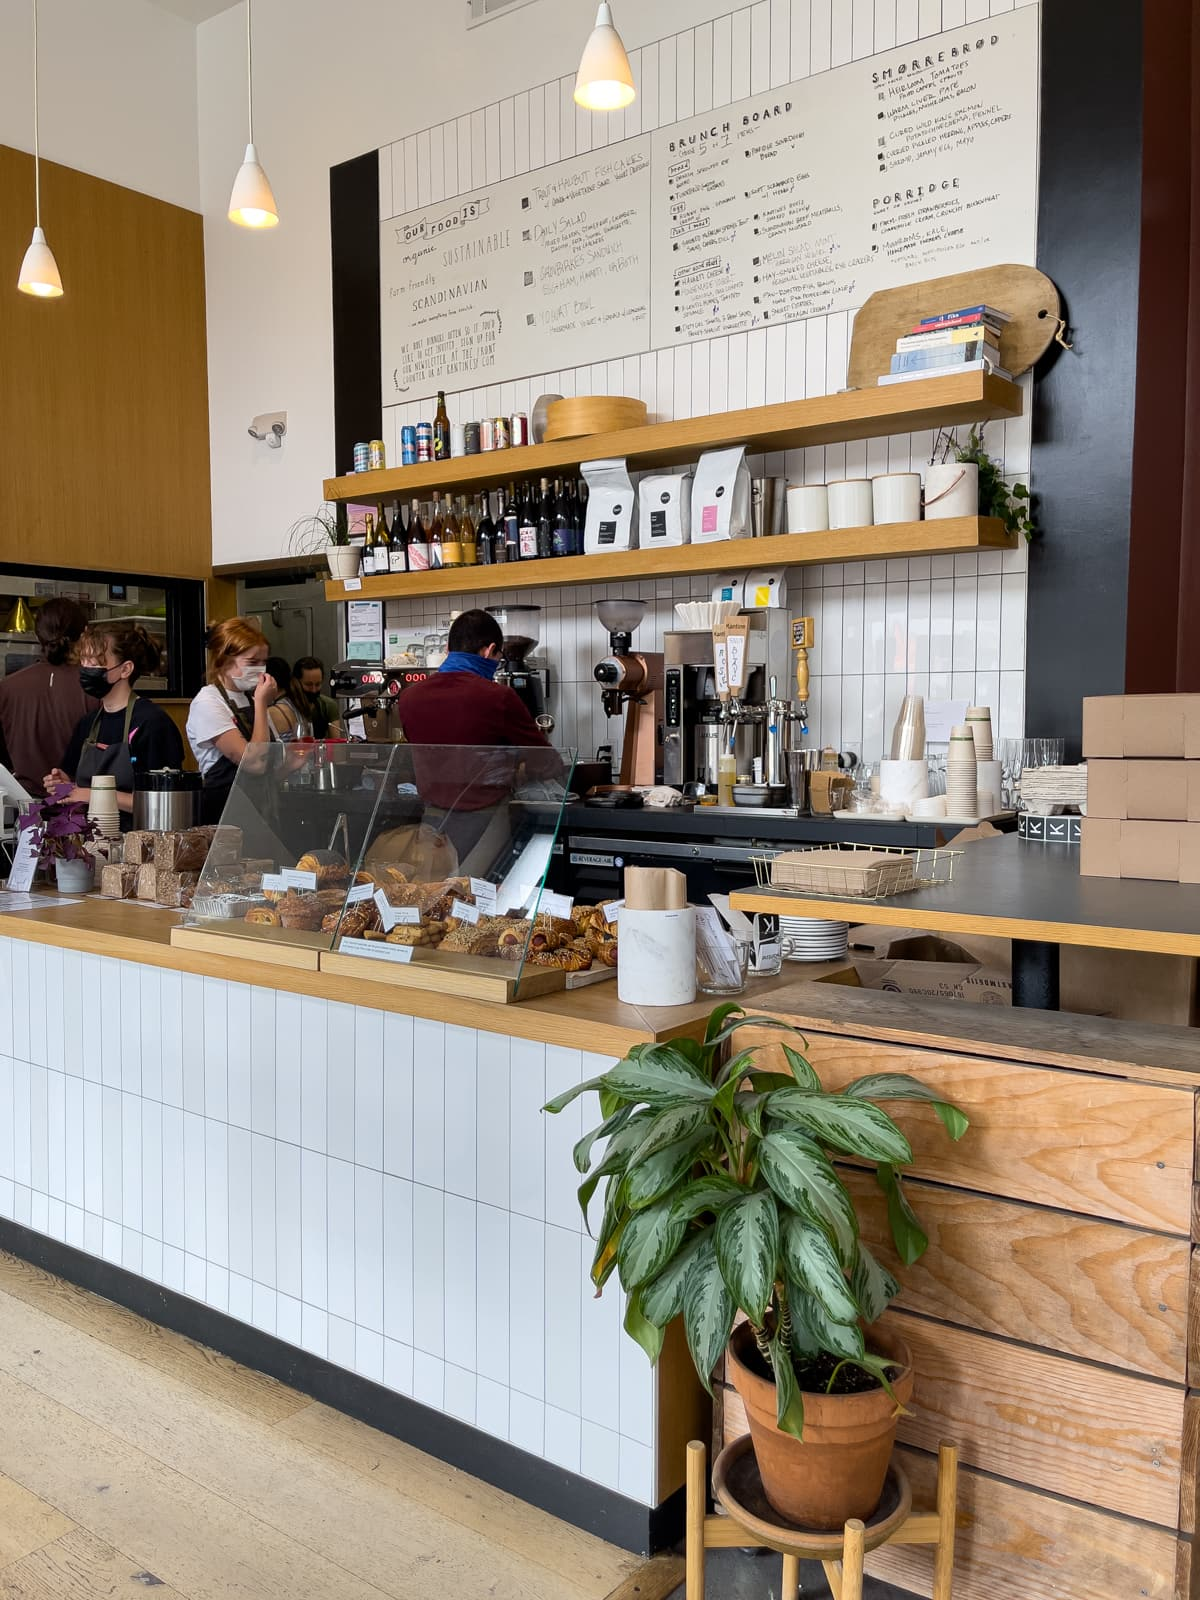 Kantine is a Scandinavian-inspired bakery in San Francisco, California